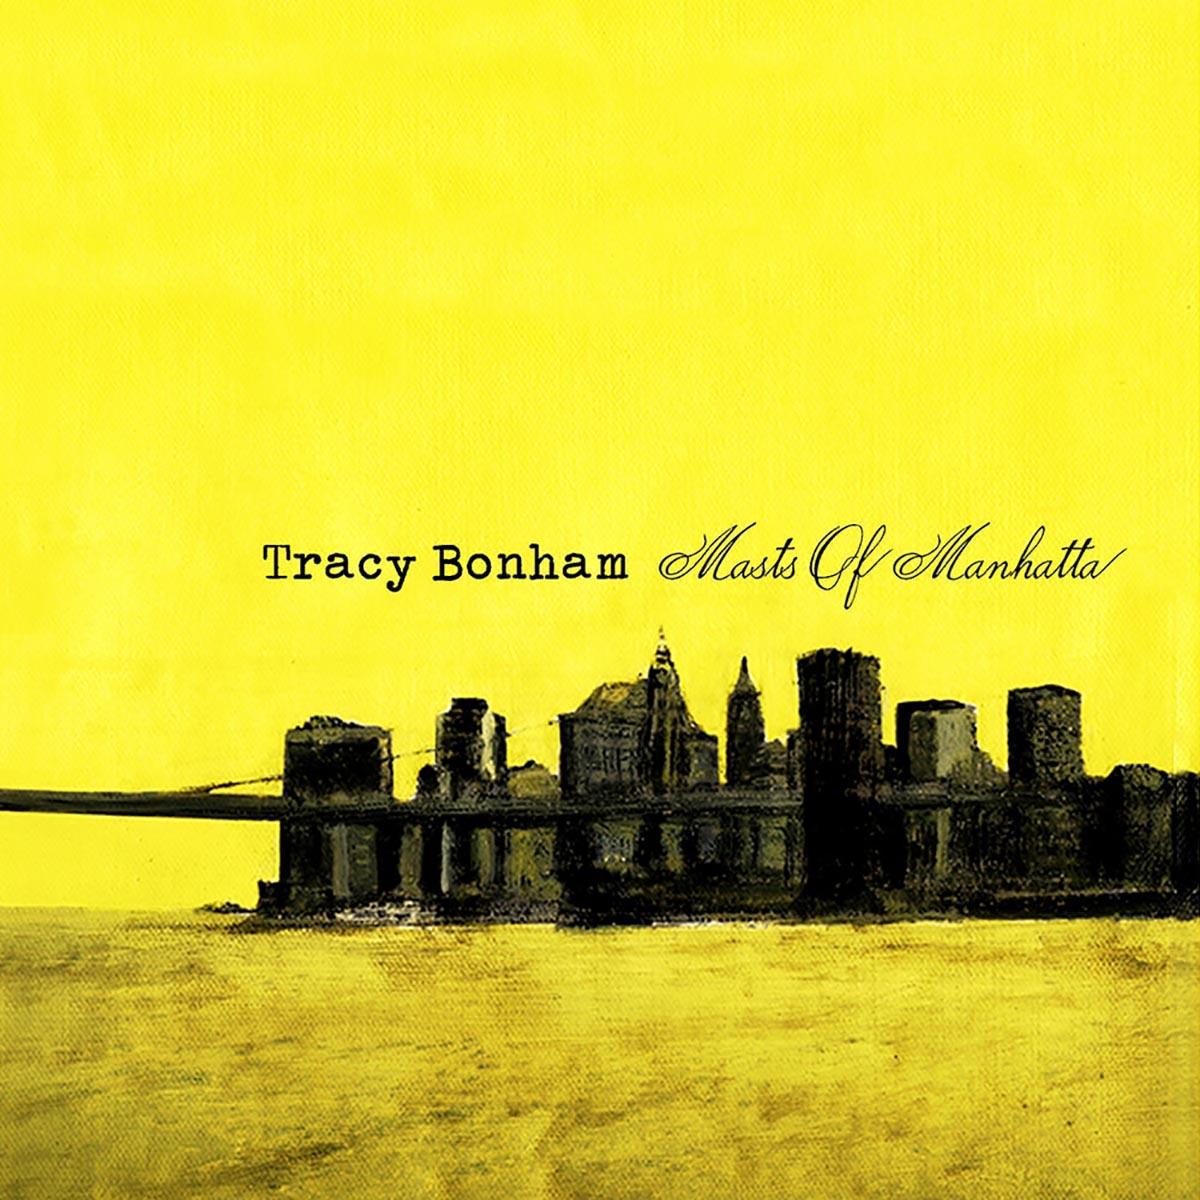 Tracy Bonham, Masts of Manhatta